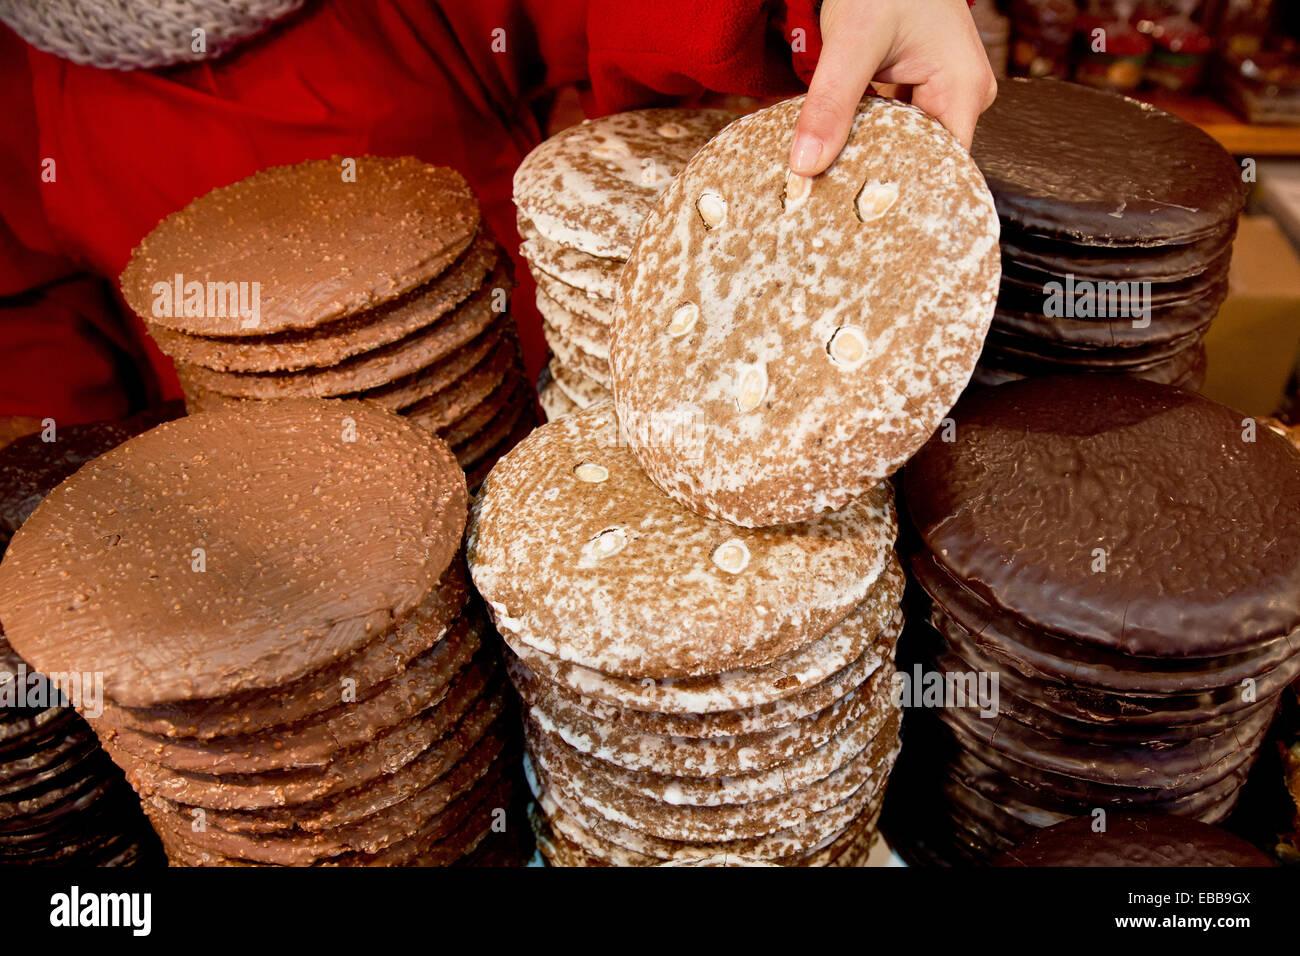 Nuremberg Germany 28th Nov 2014 Elisen Lebkuchen Cookies Are On